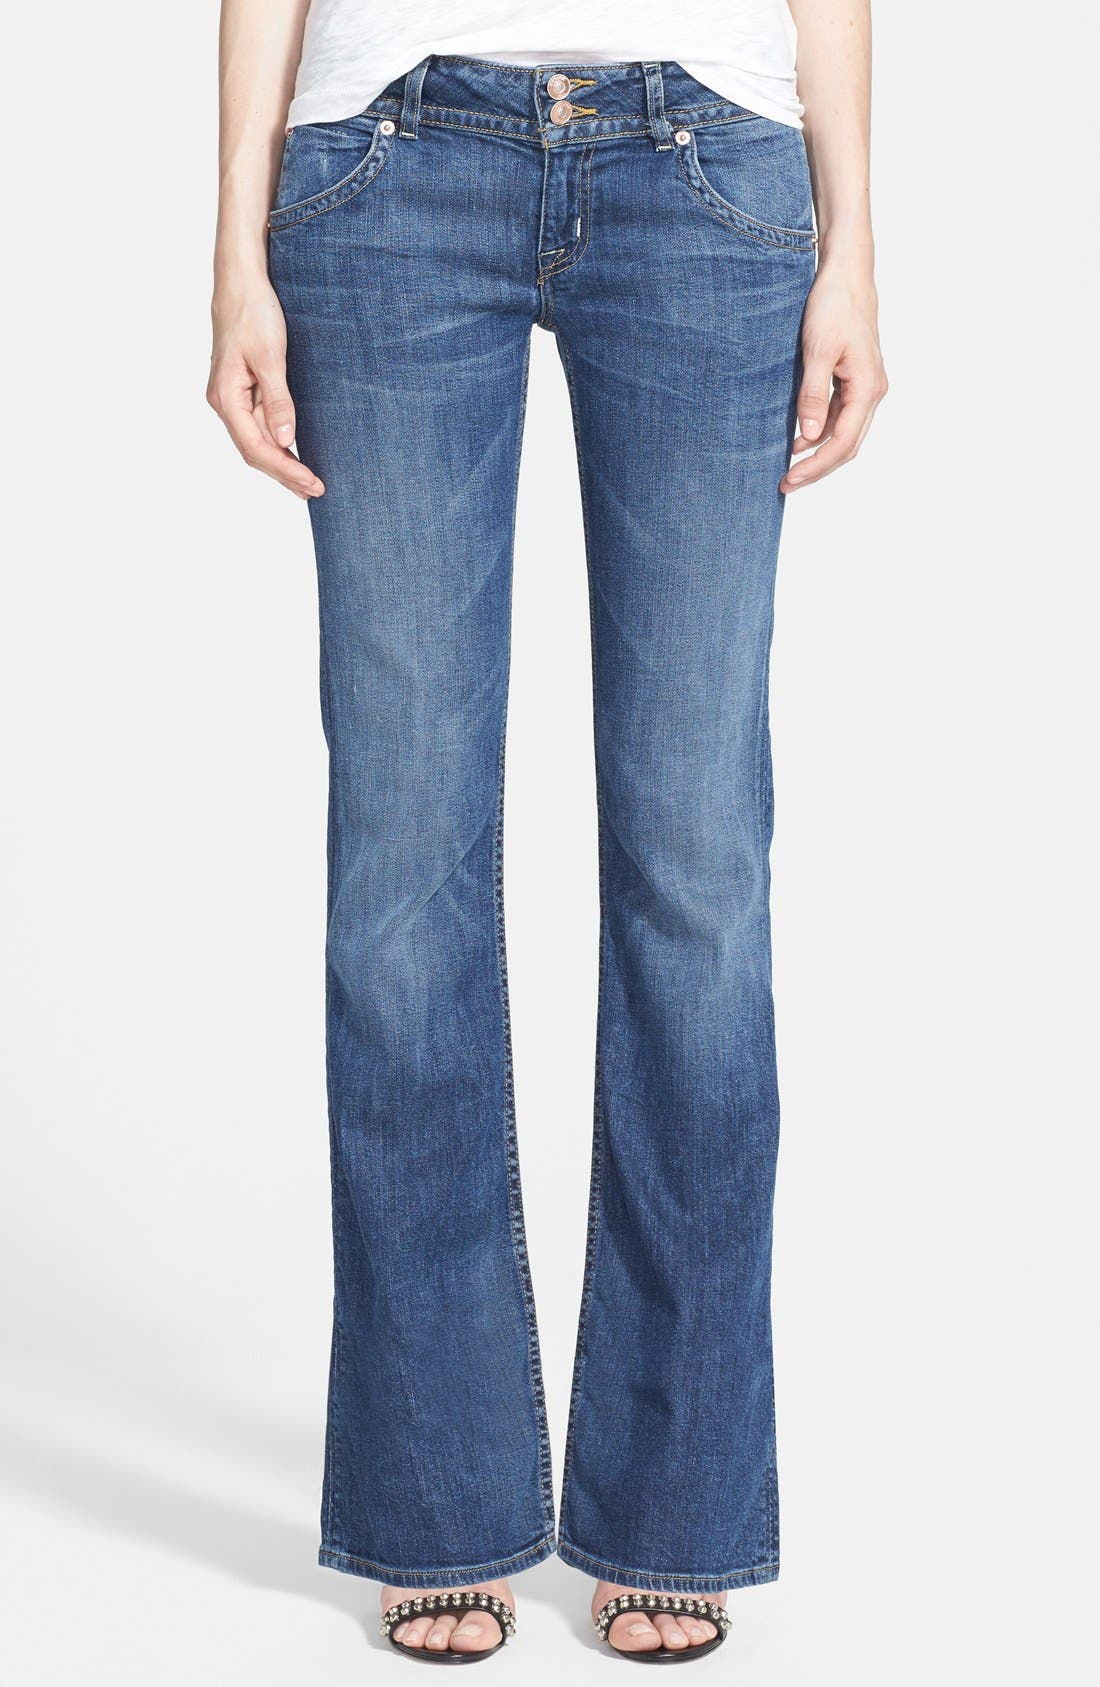 Alternate Image 1 Selected - Hudson Jeans 'Signature' Bootcut Jeans (Hackney) (Petite)